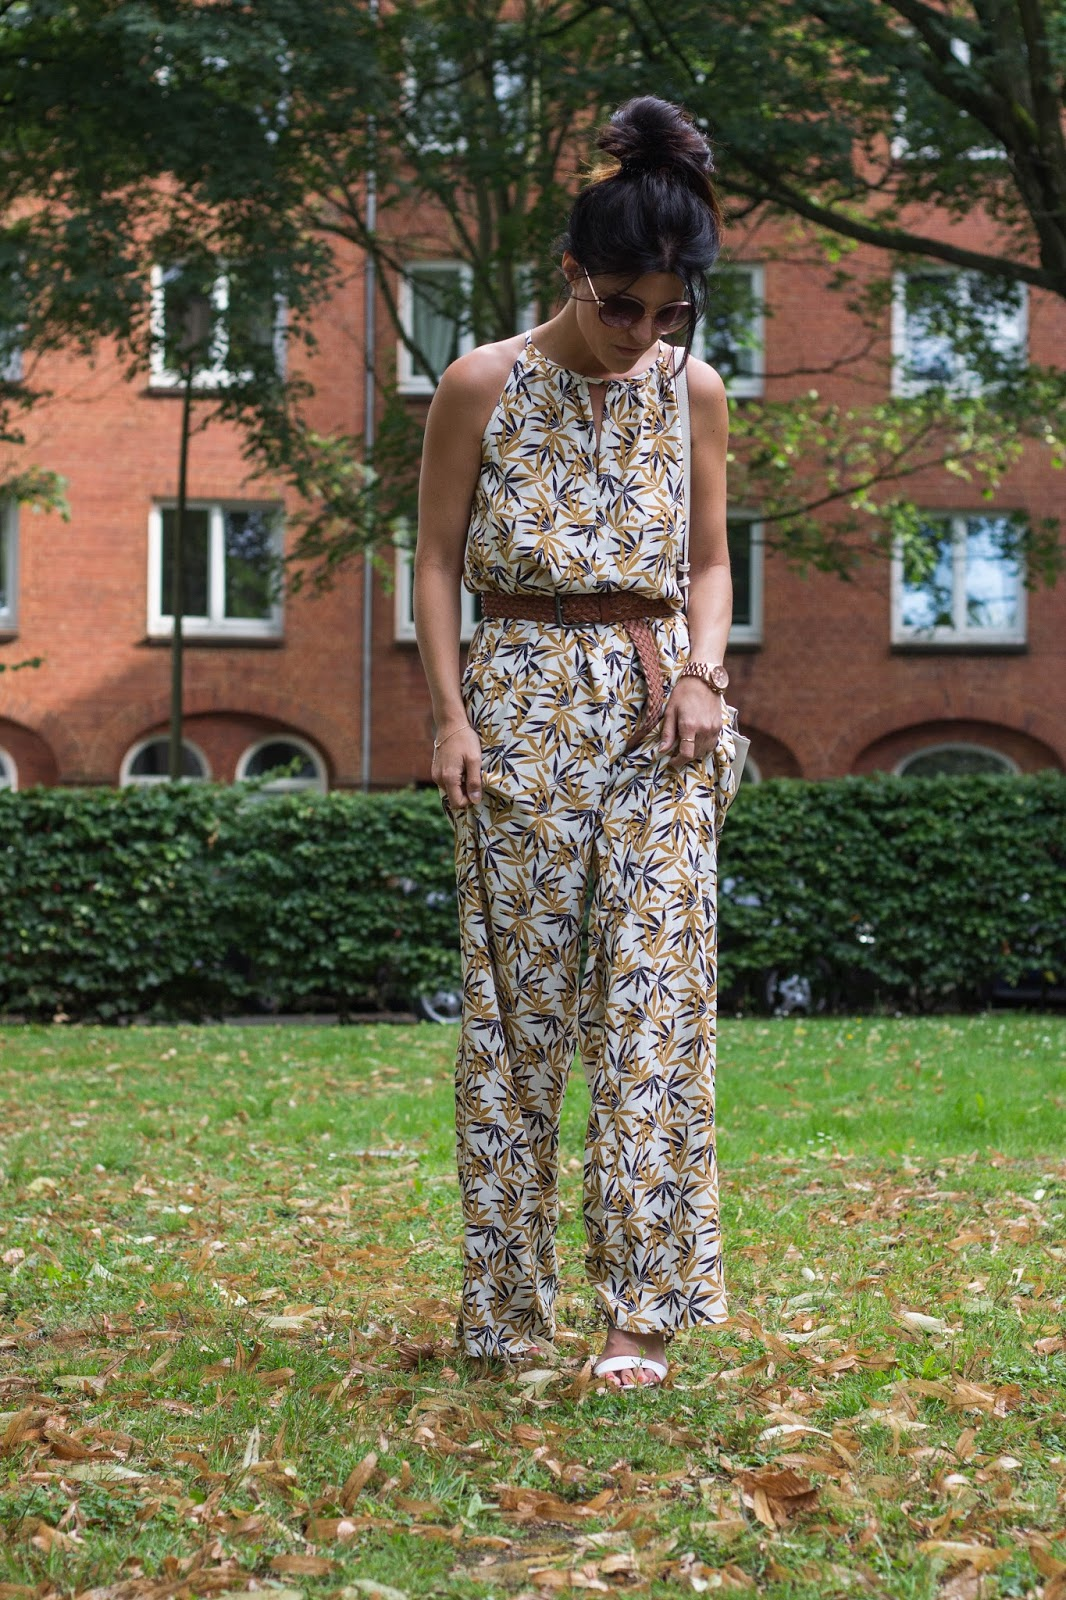 http://fashionavenueabc.blogspot.de/2016/08/leaves-print.html